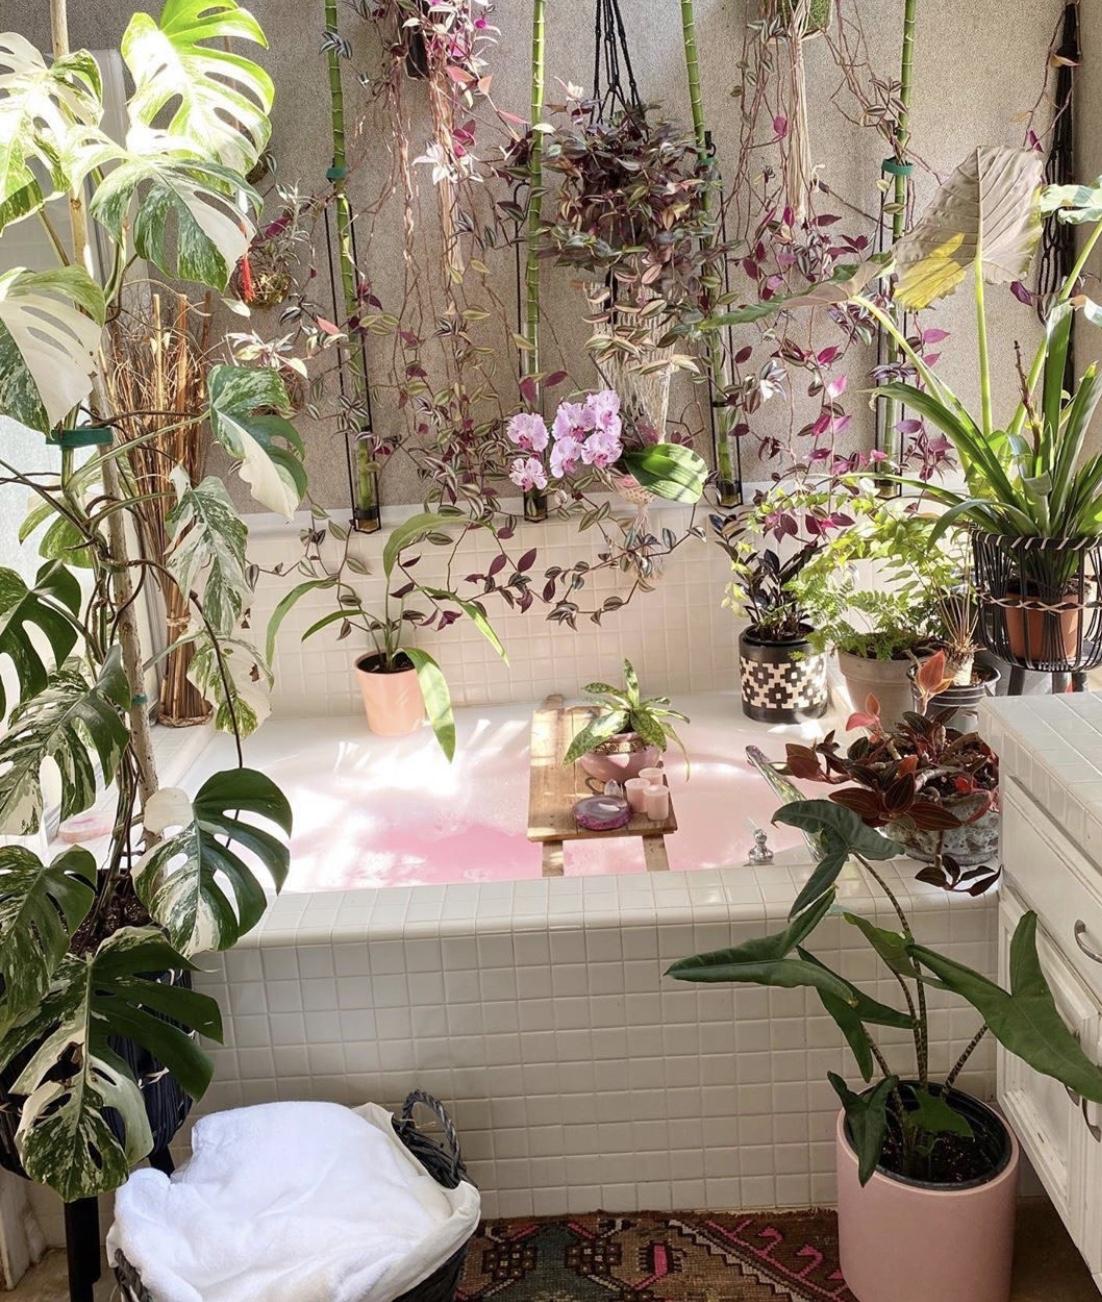 Luxju - Self Care At Home